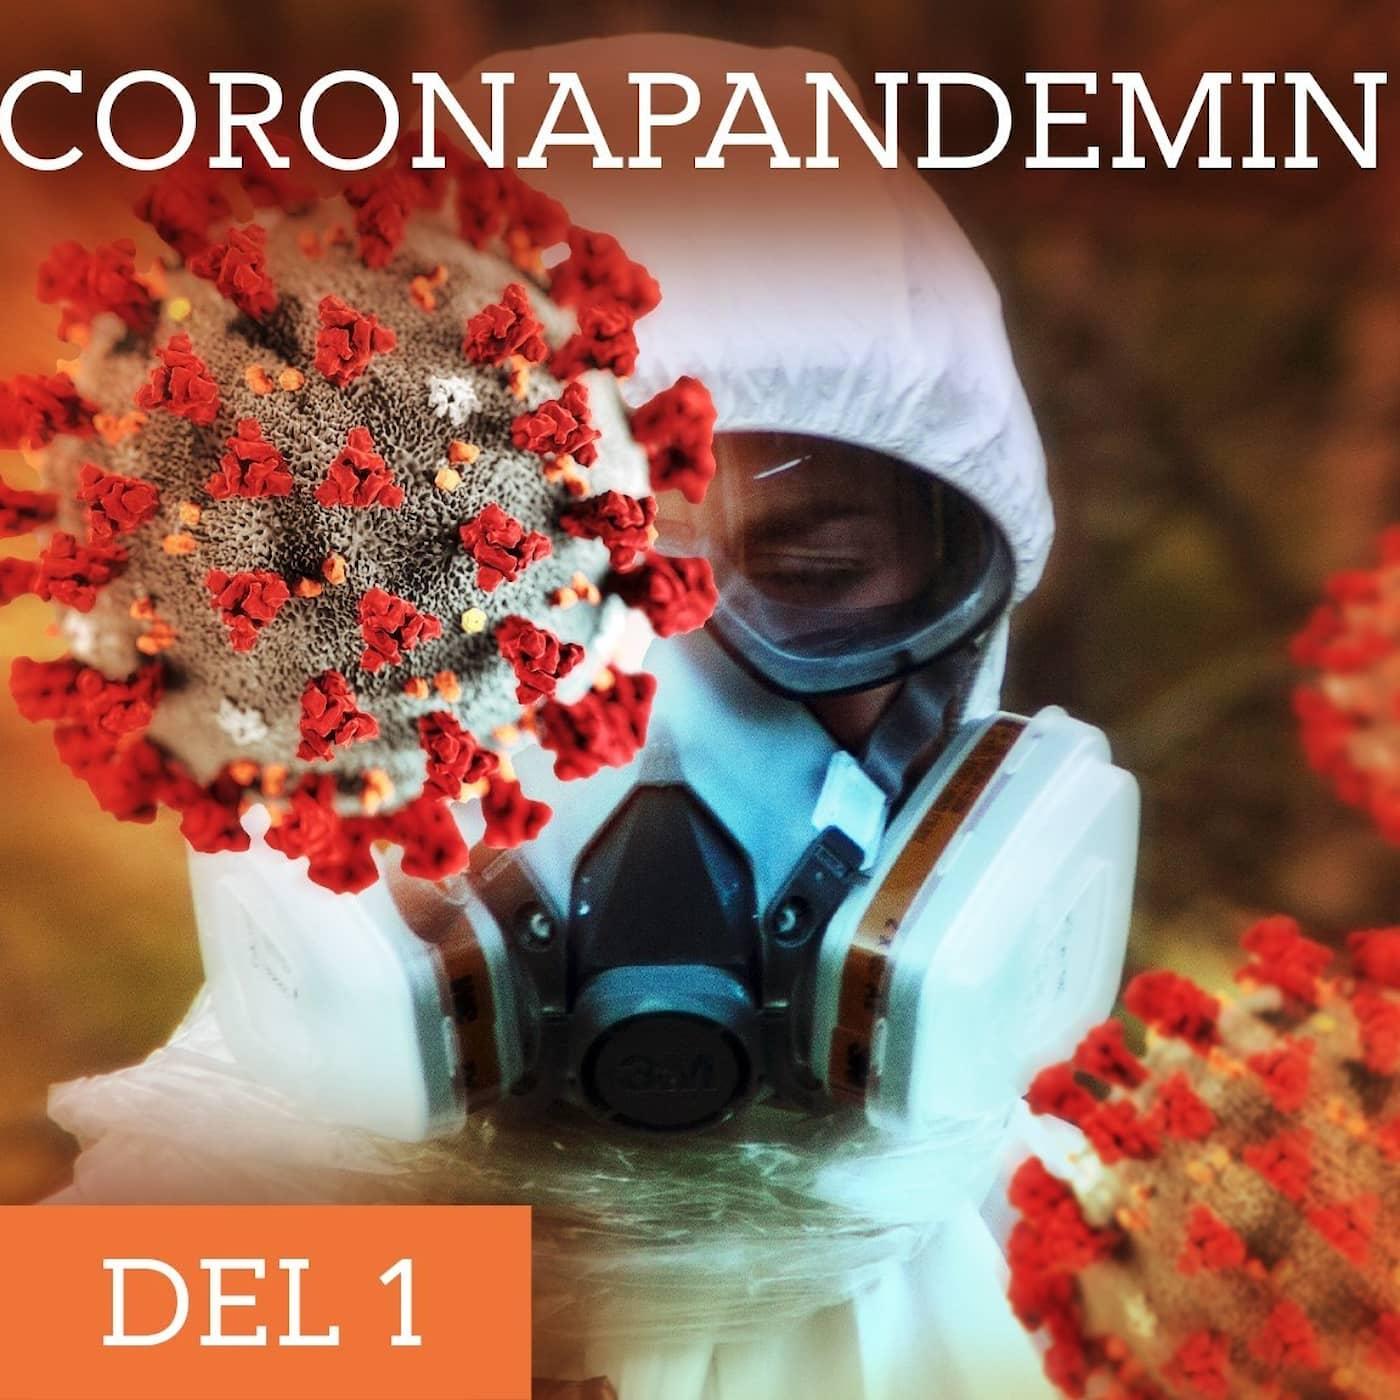 Coronapandemin: Den dolda smittan